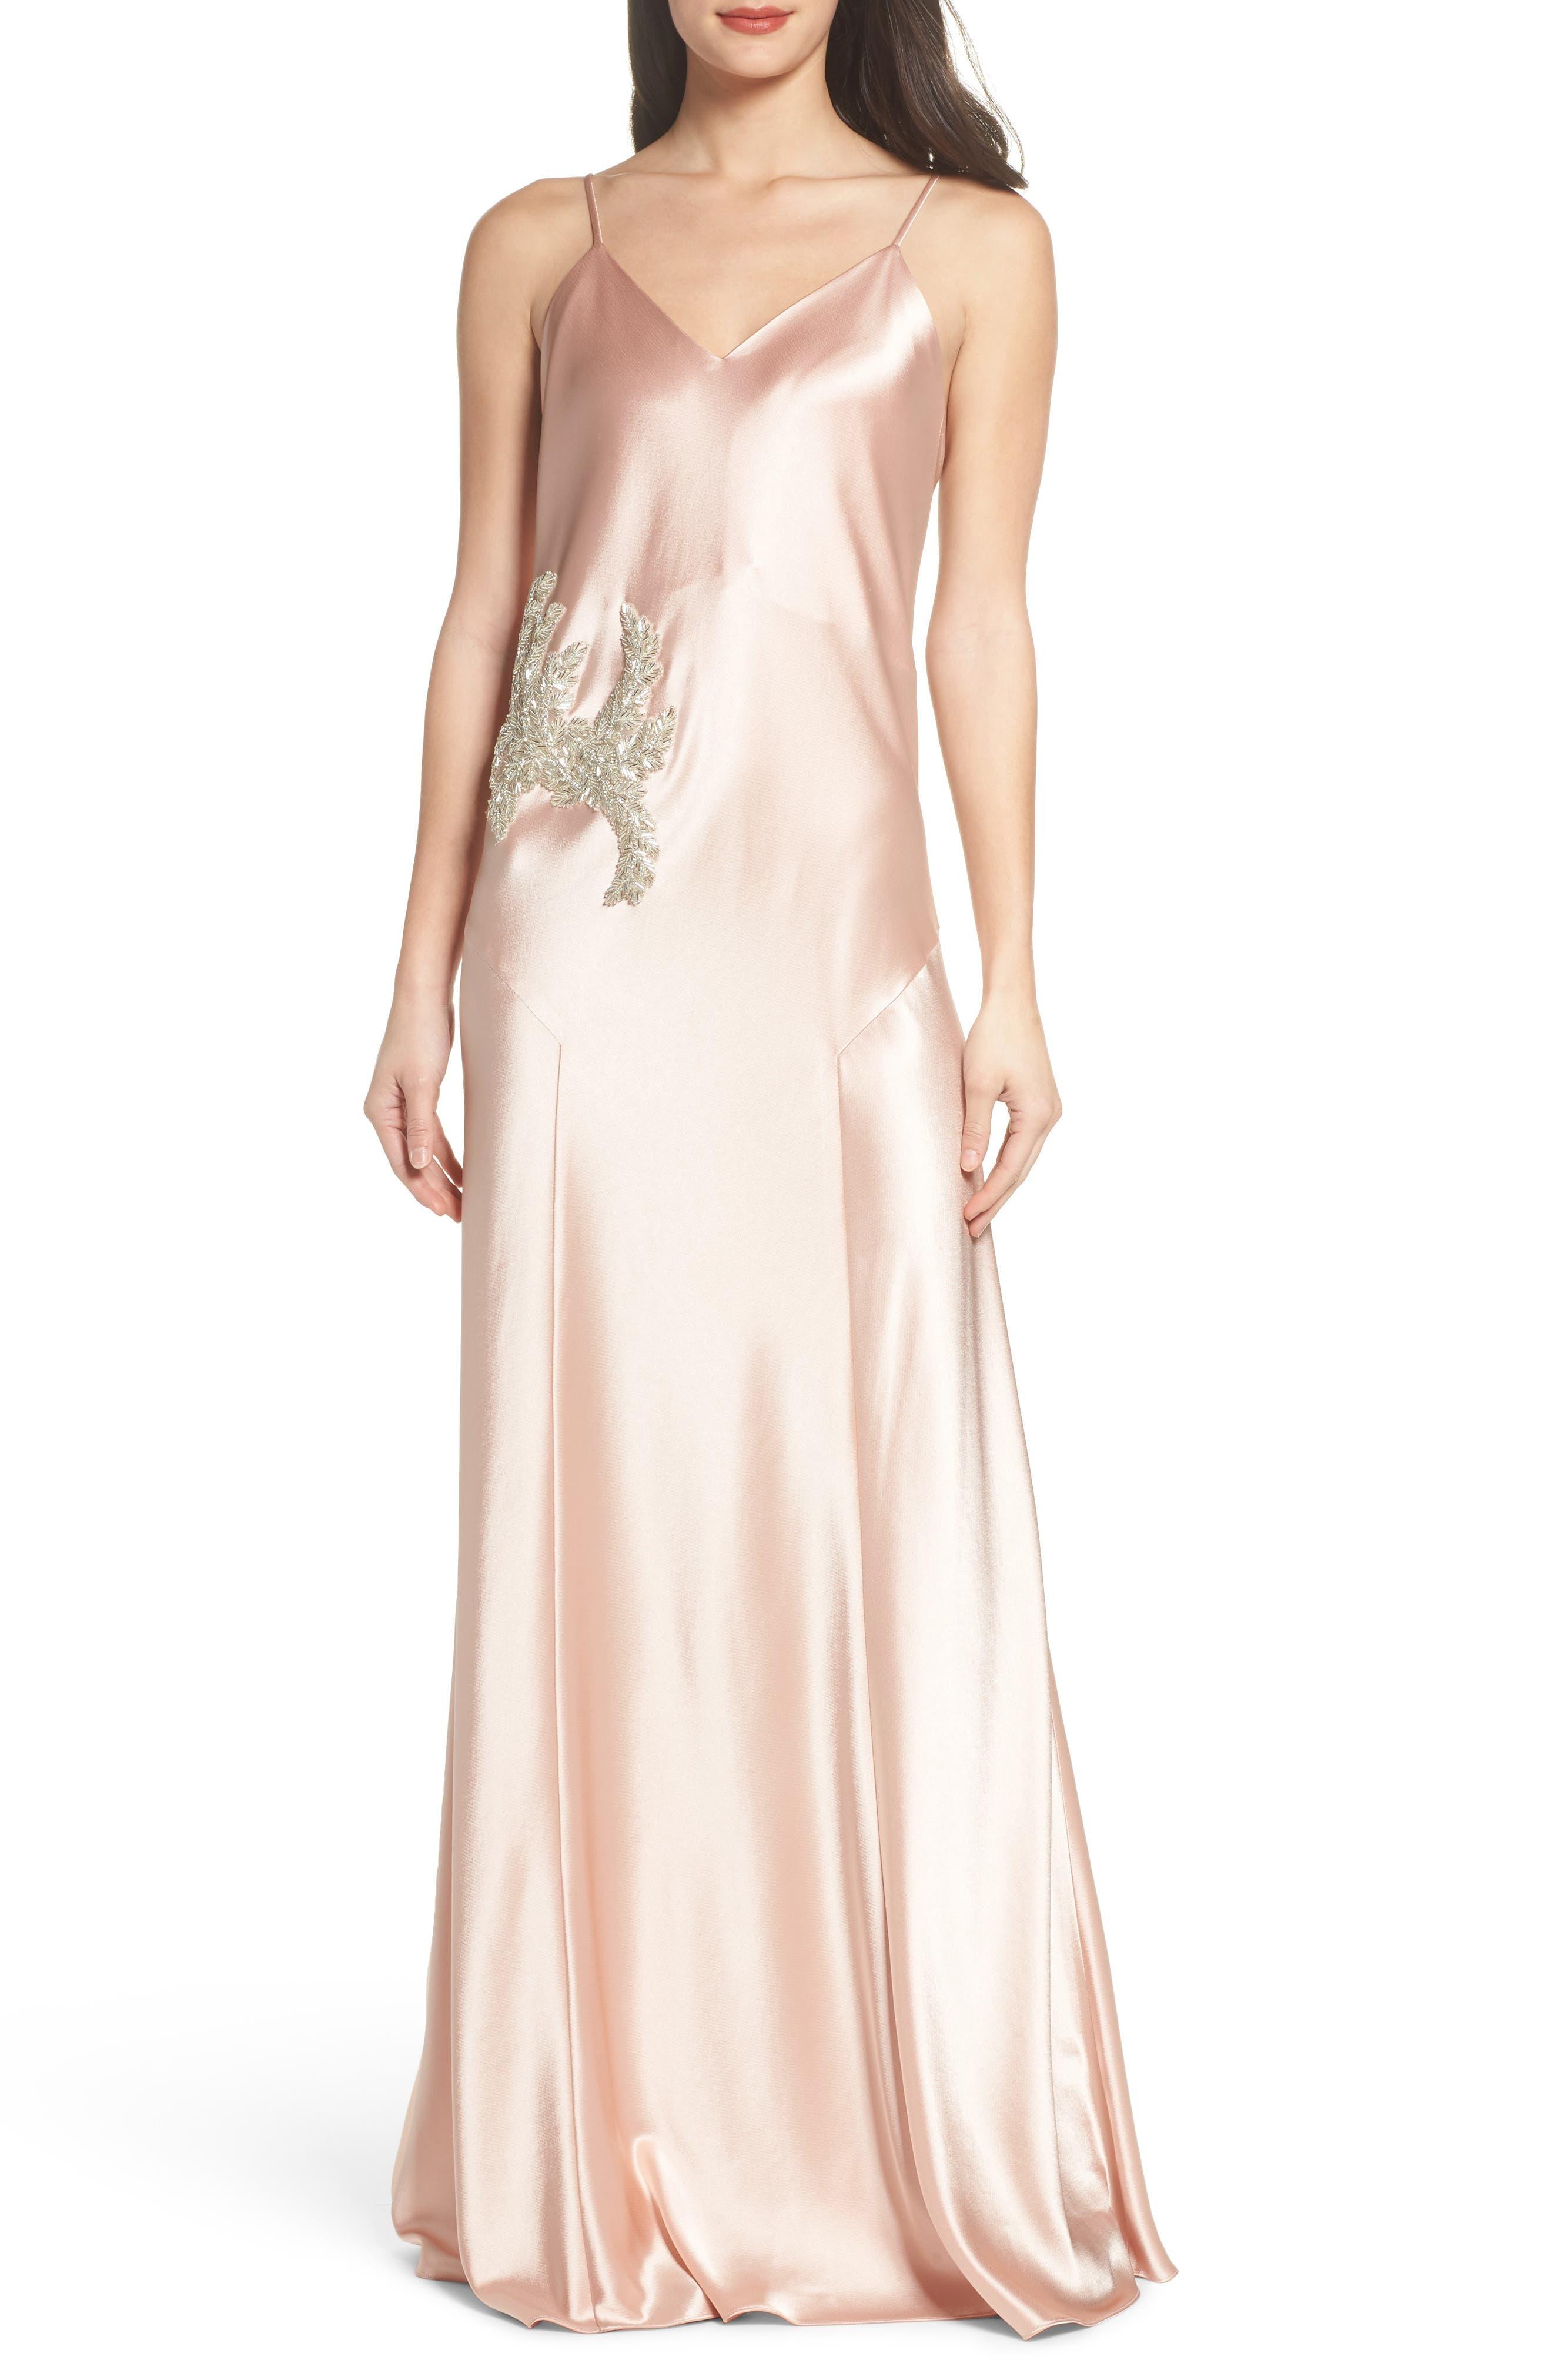 Carmen Embellished Satin Slip Gown,                             Main thumbnail 1, color,                             691